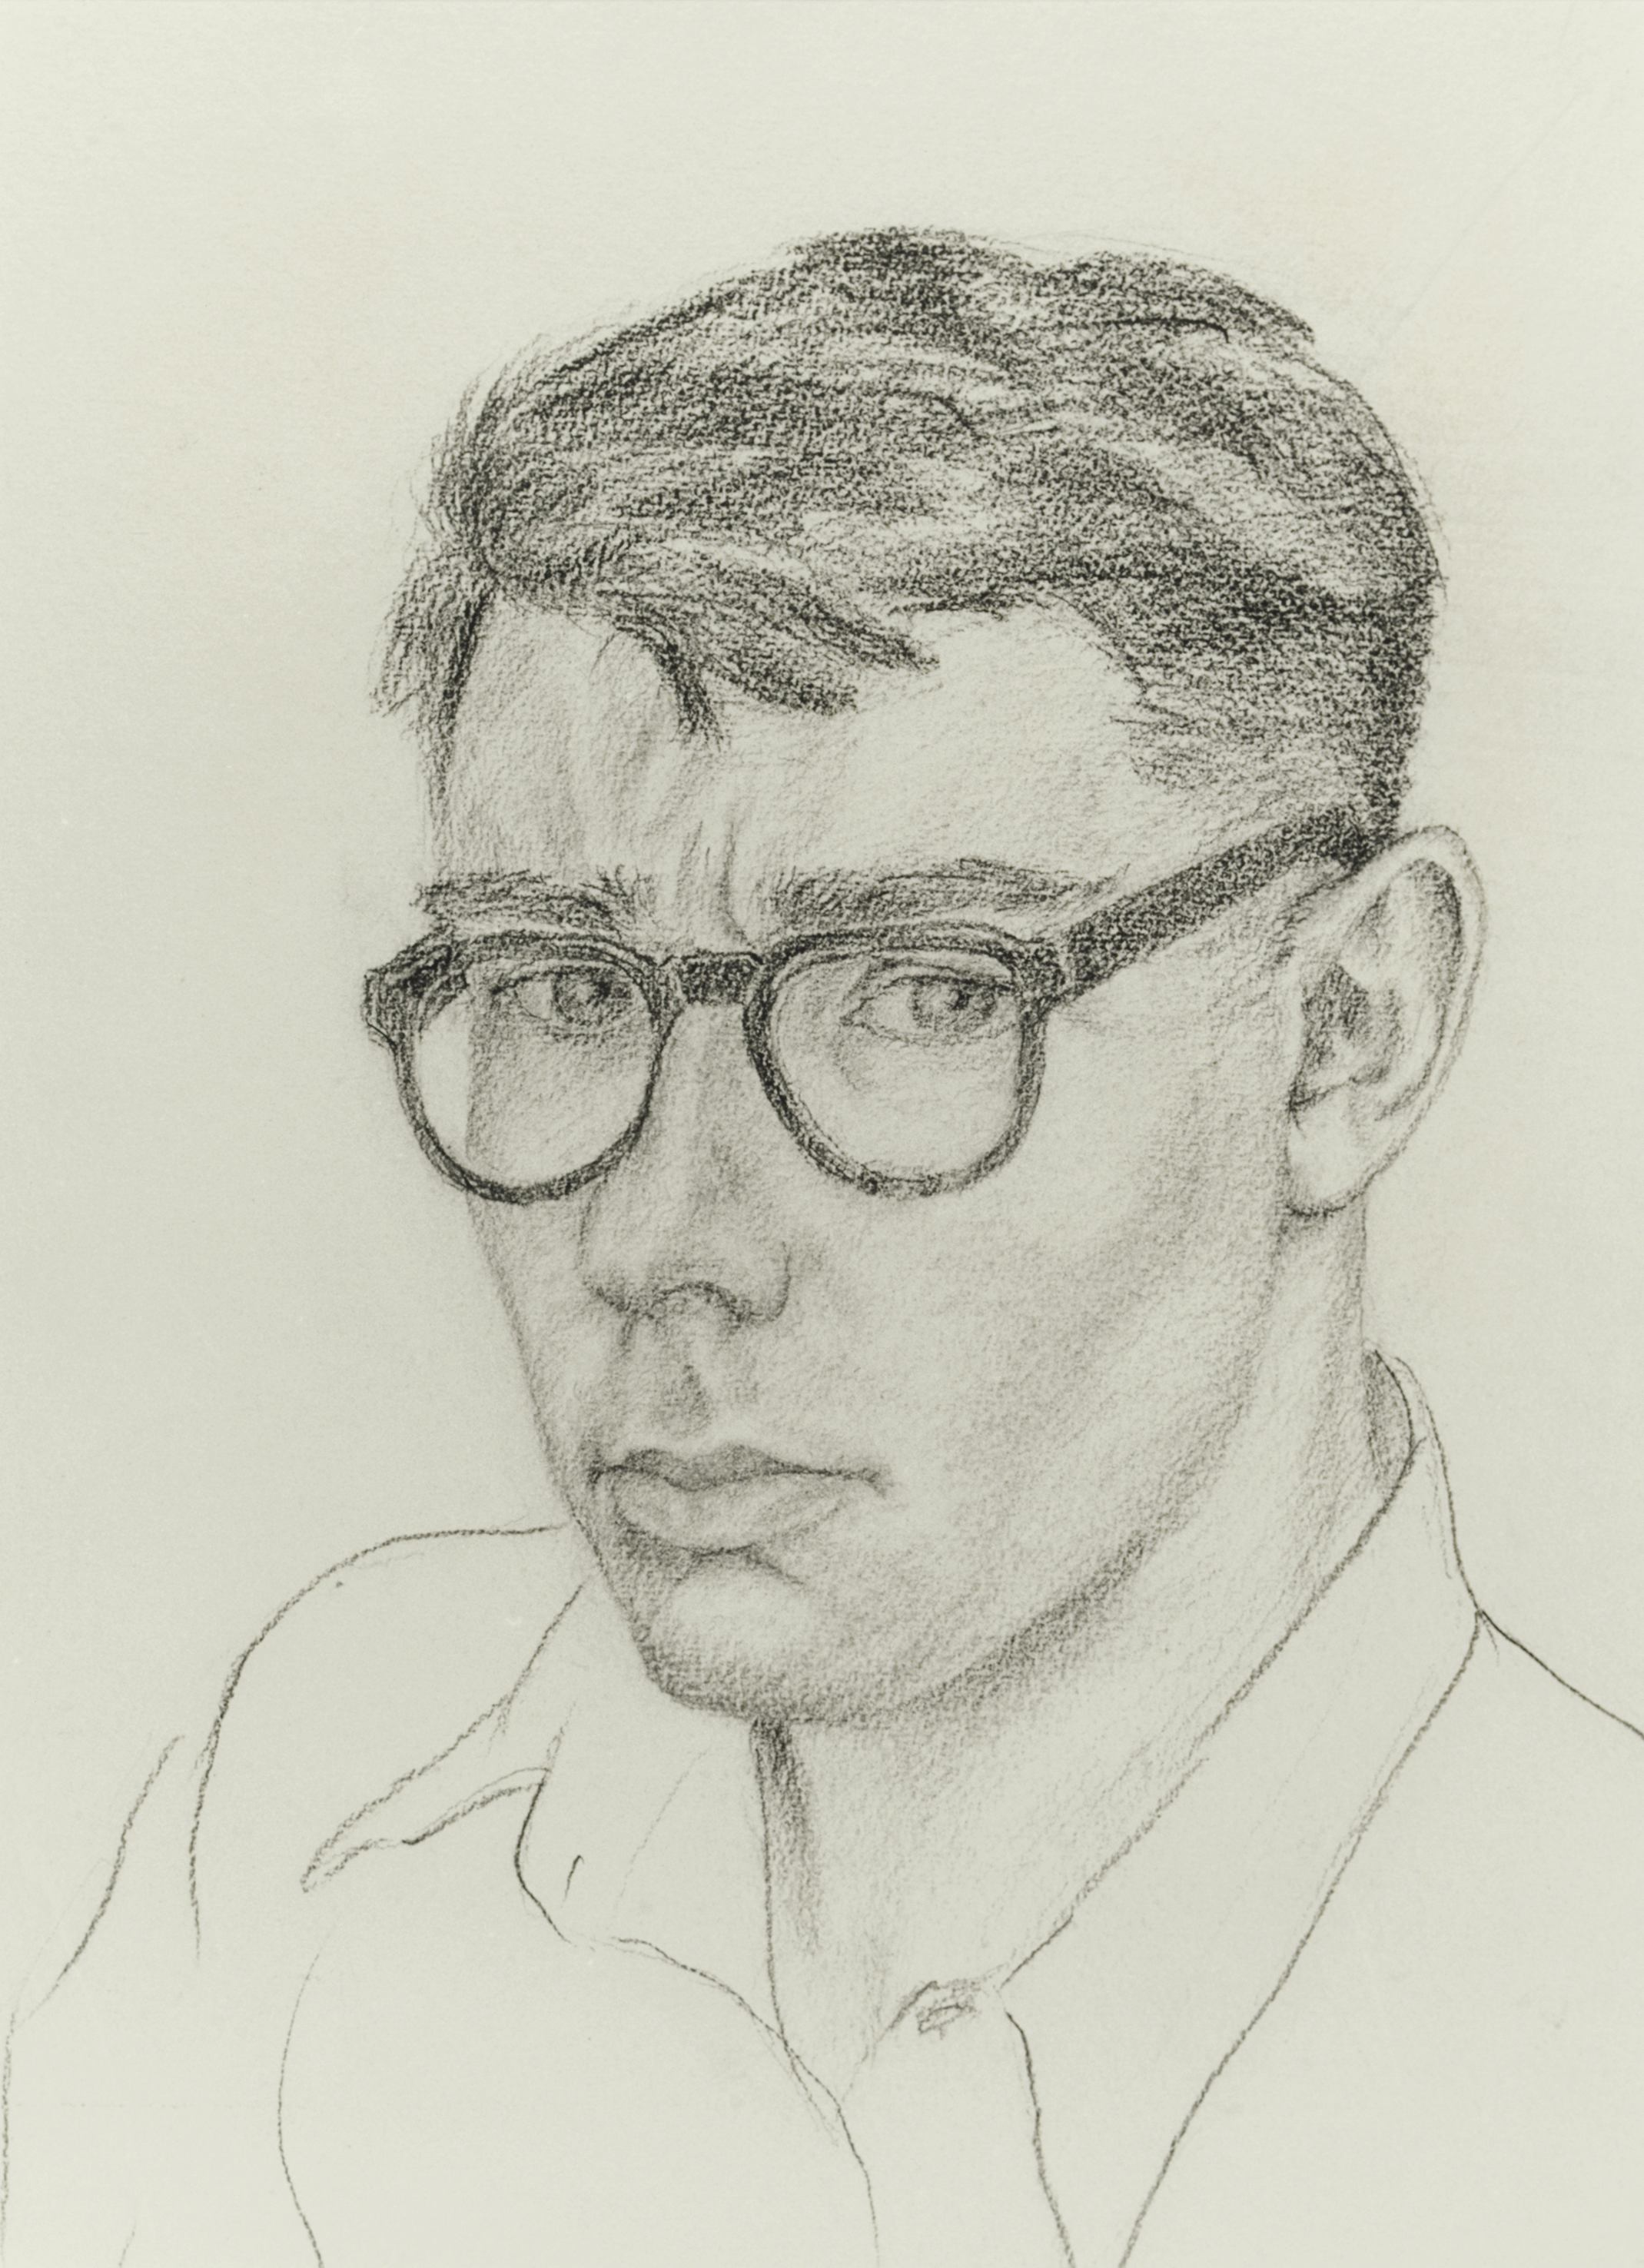 Sketch of Peter Eldershaw (1927-1967)